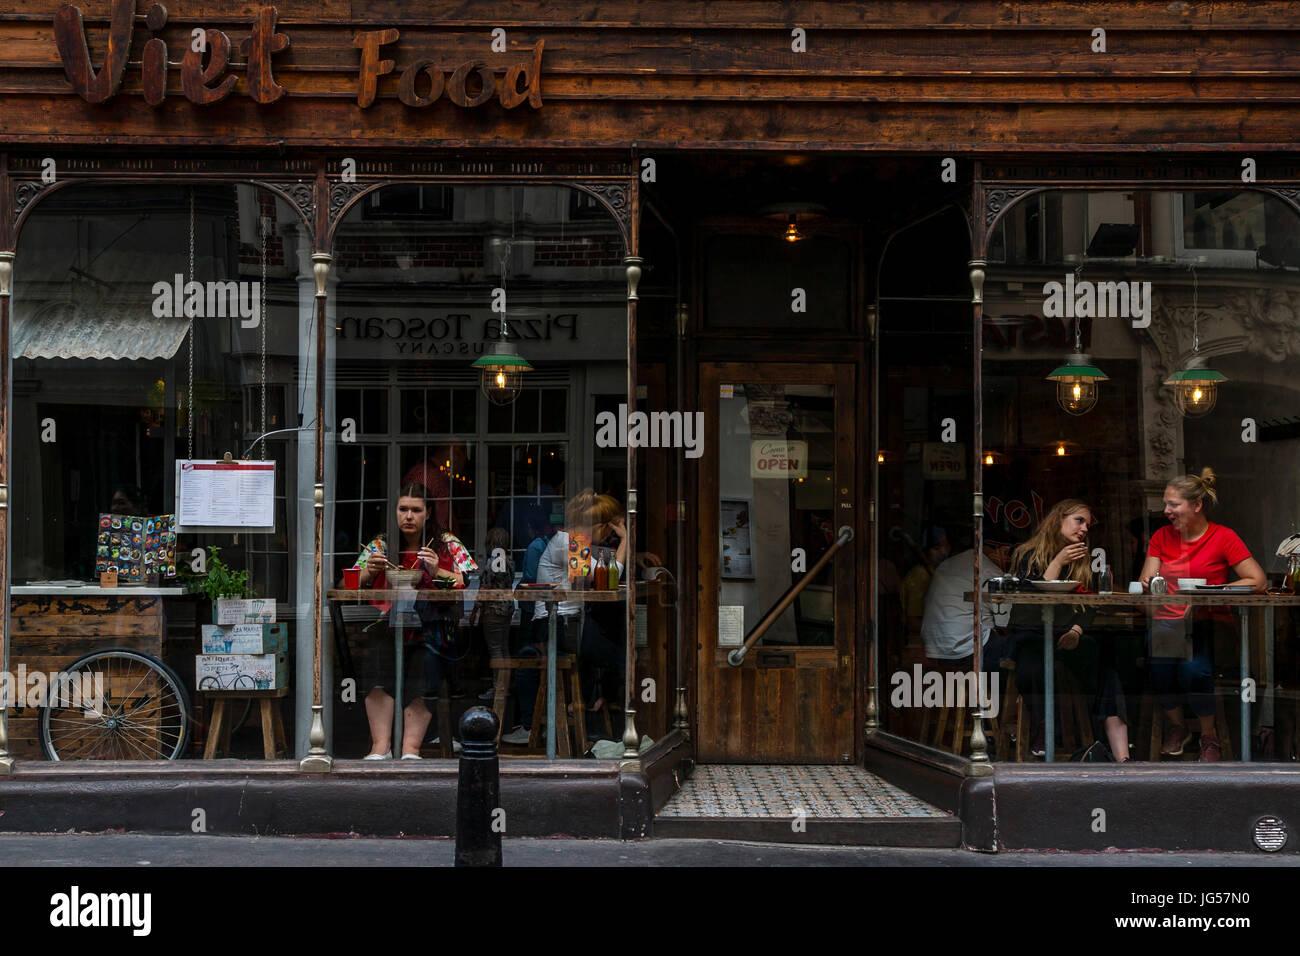 People Eating Vietnamese Food In The Viet Food Restaurant, Wardour Street, London, UK - Stock Image